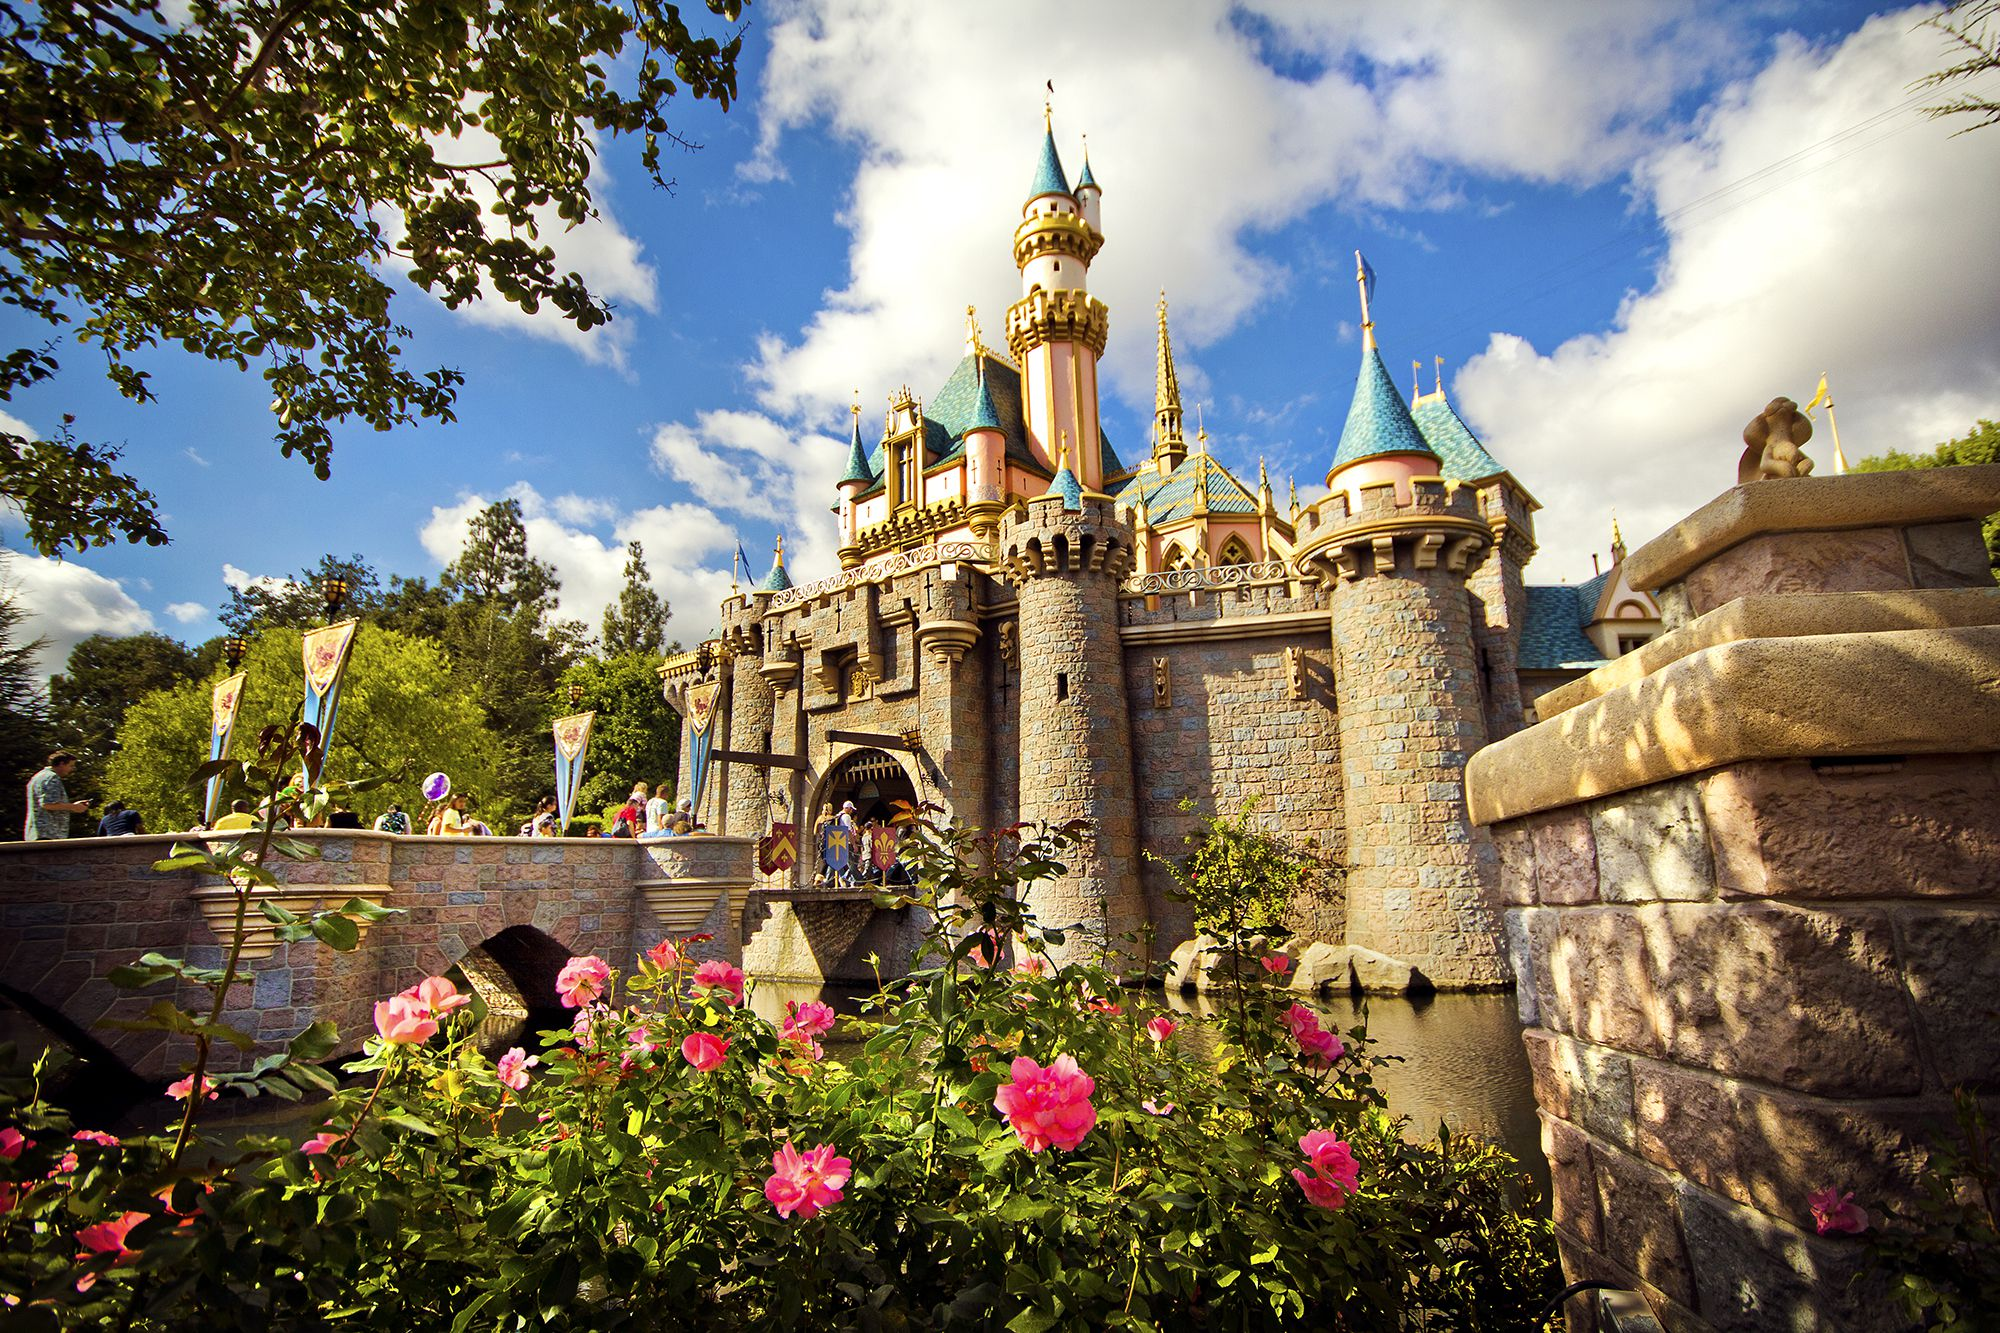 23 Things to Do Near Disneyland California